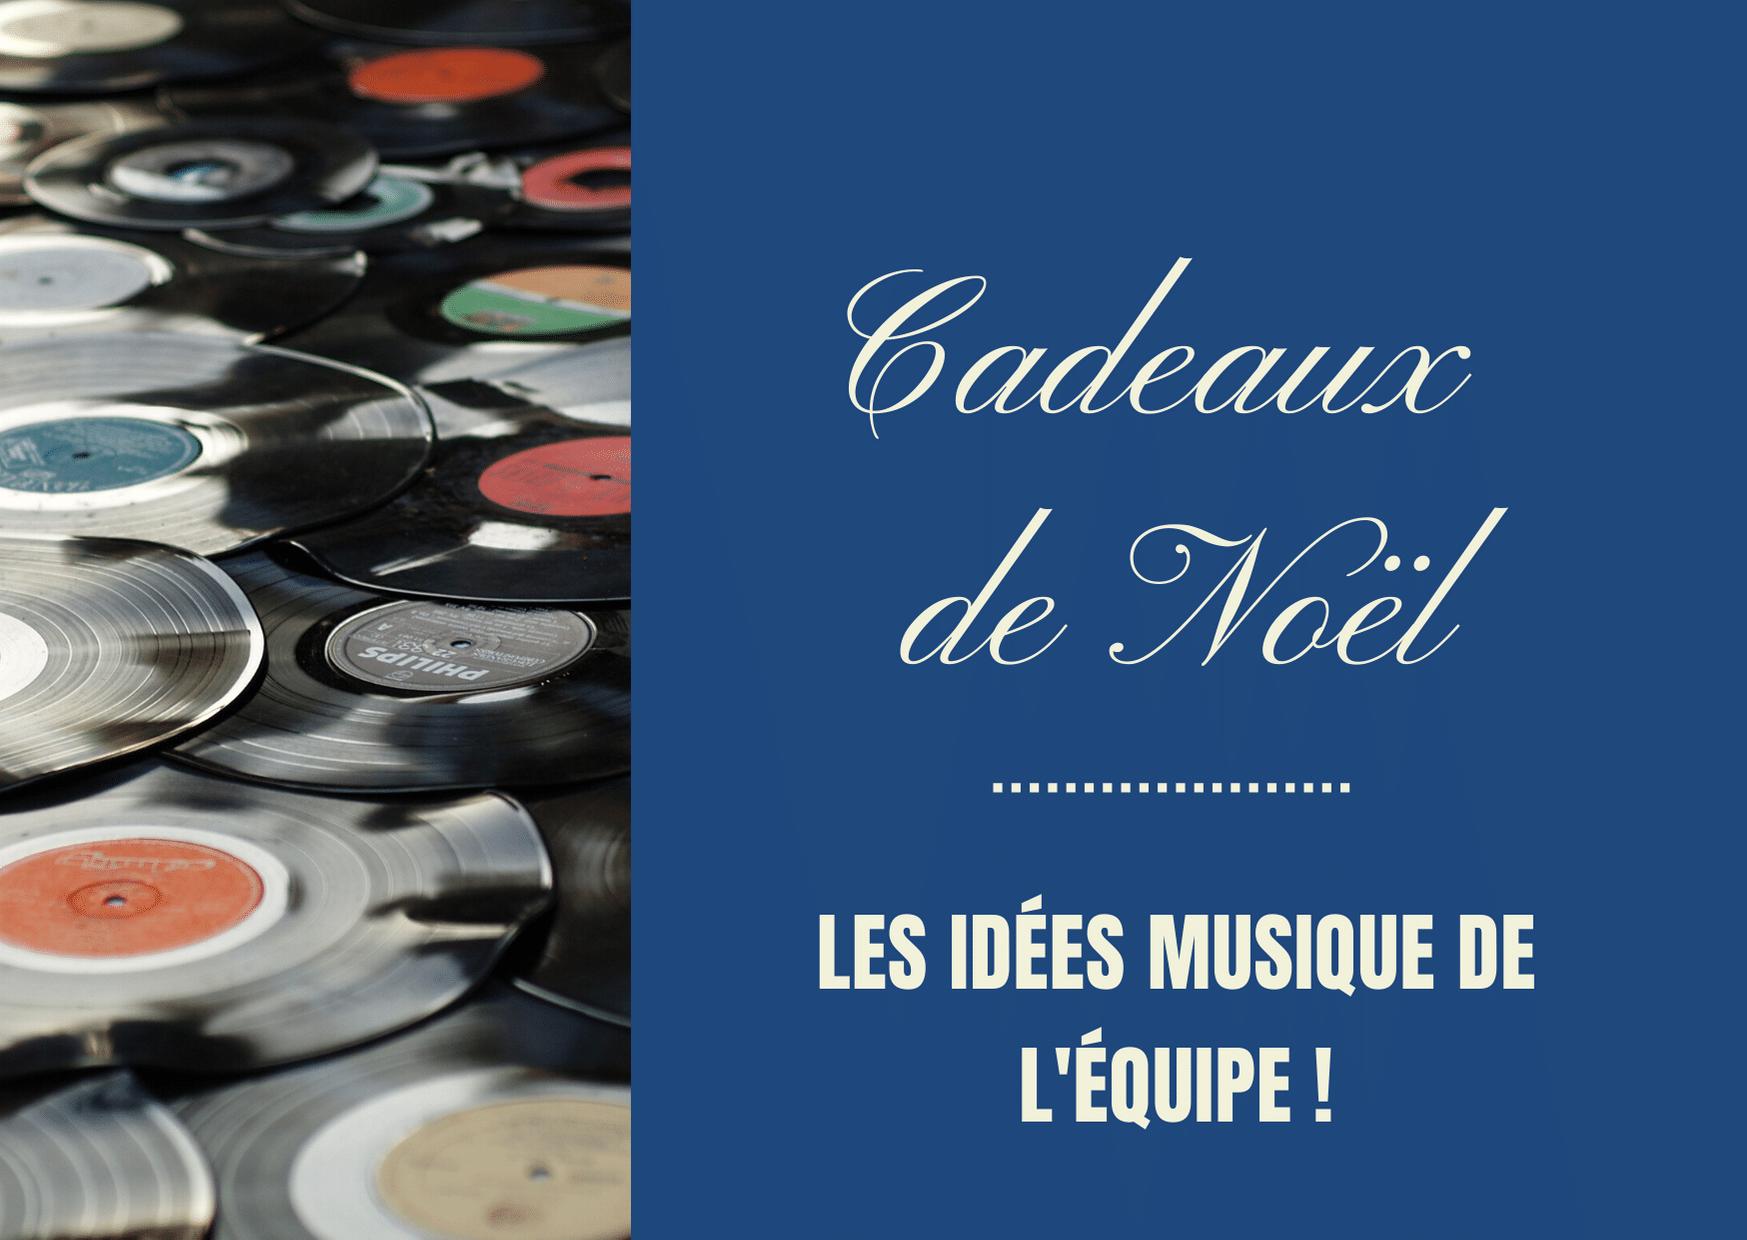 Cadeaux De Noel Idees Musique De L Equipe Wave Radio 89 8 Hossegor Landes